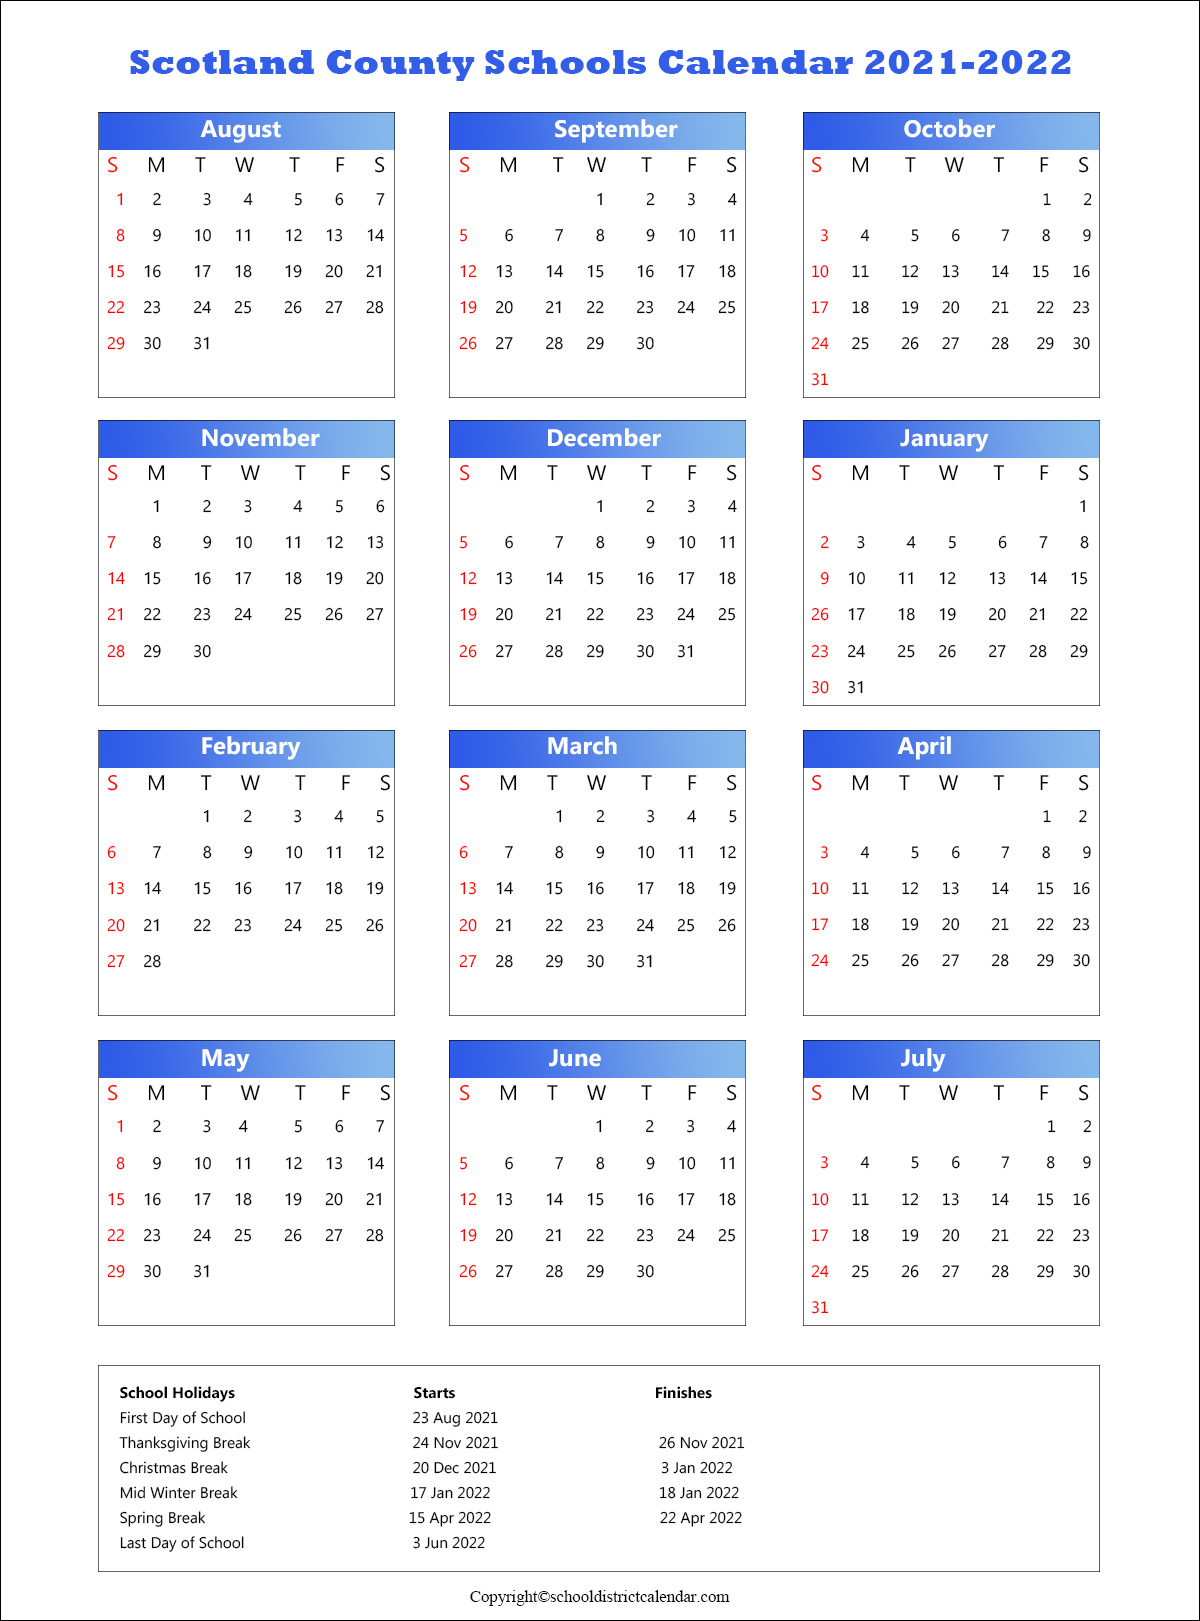 Scotland County Schools Calendar, Laurinburg Holidays 2021